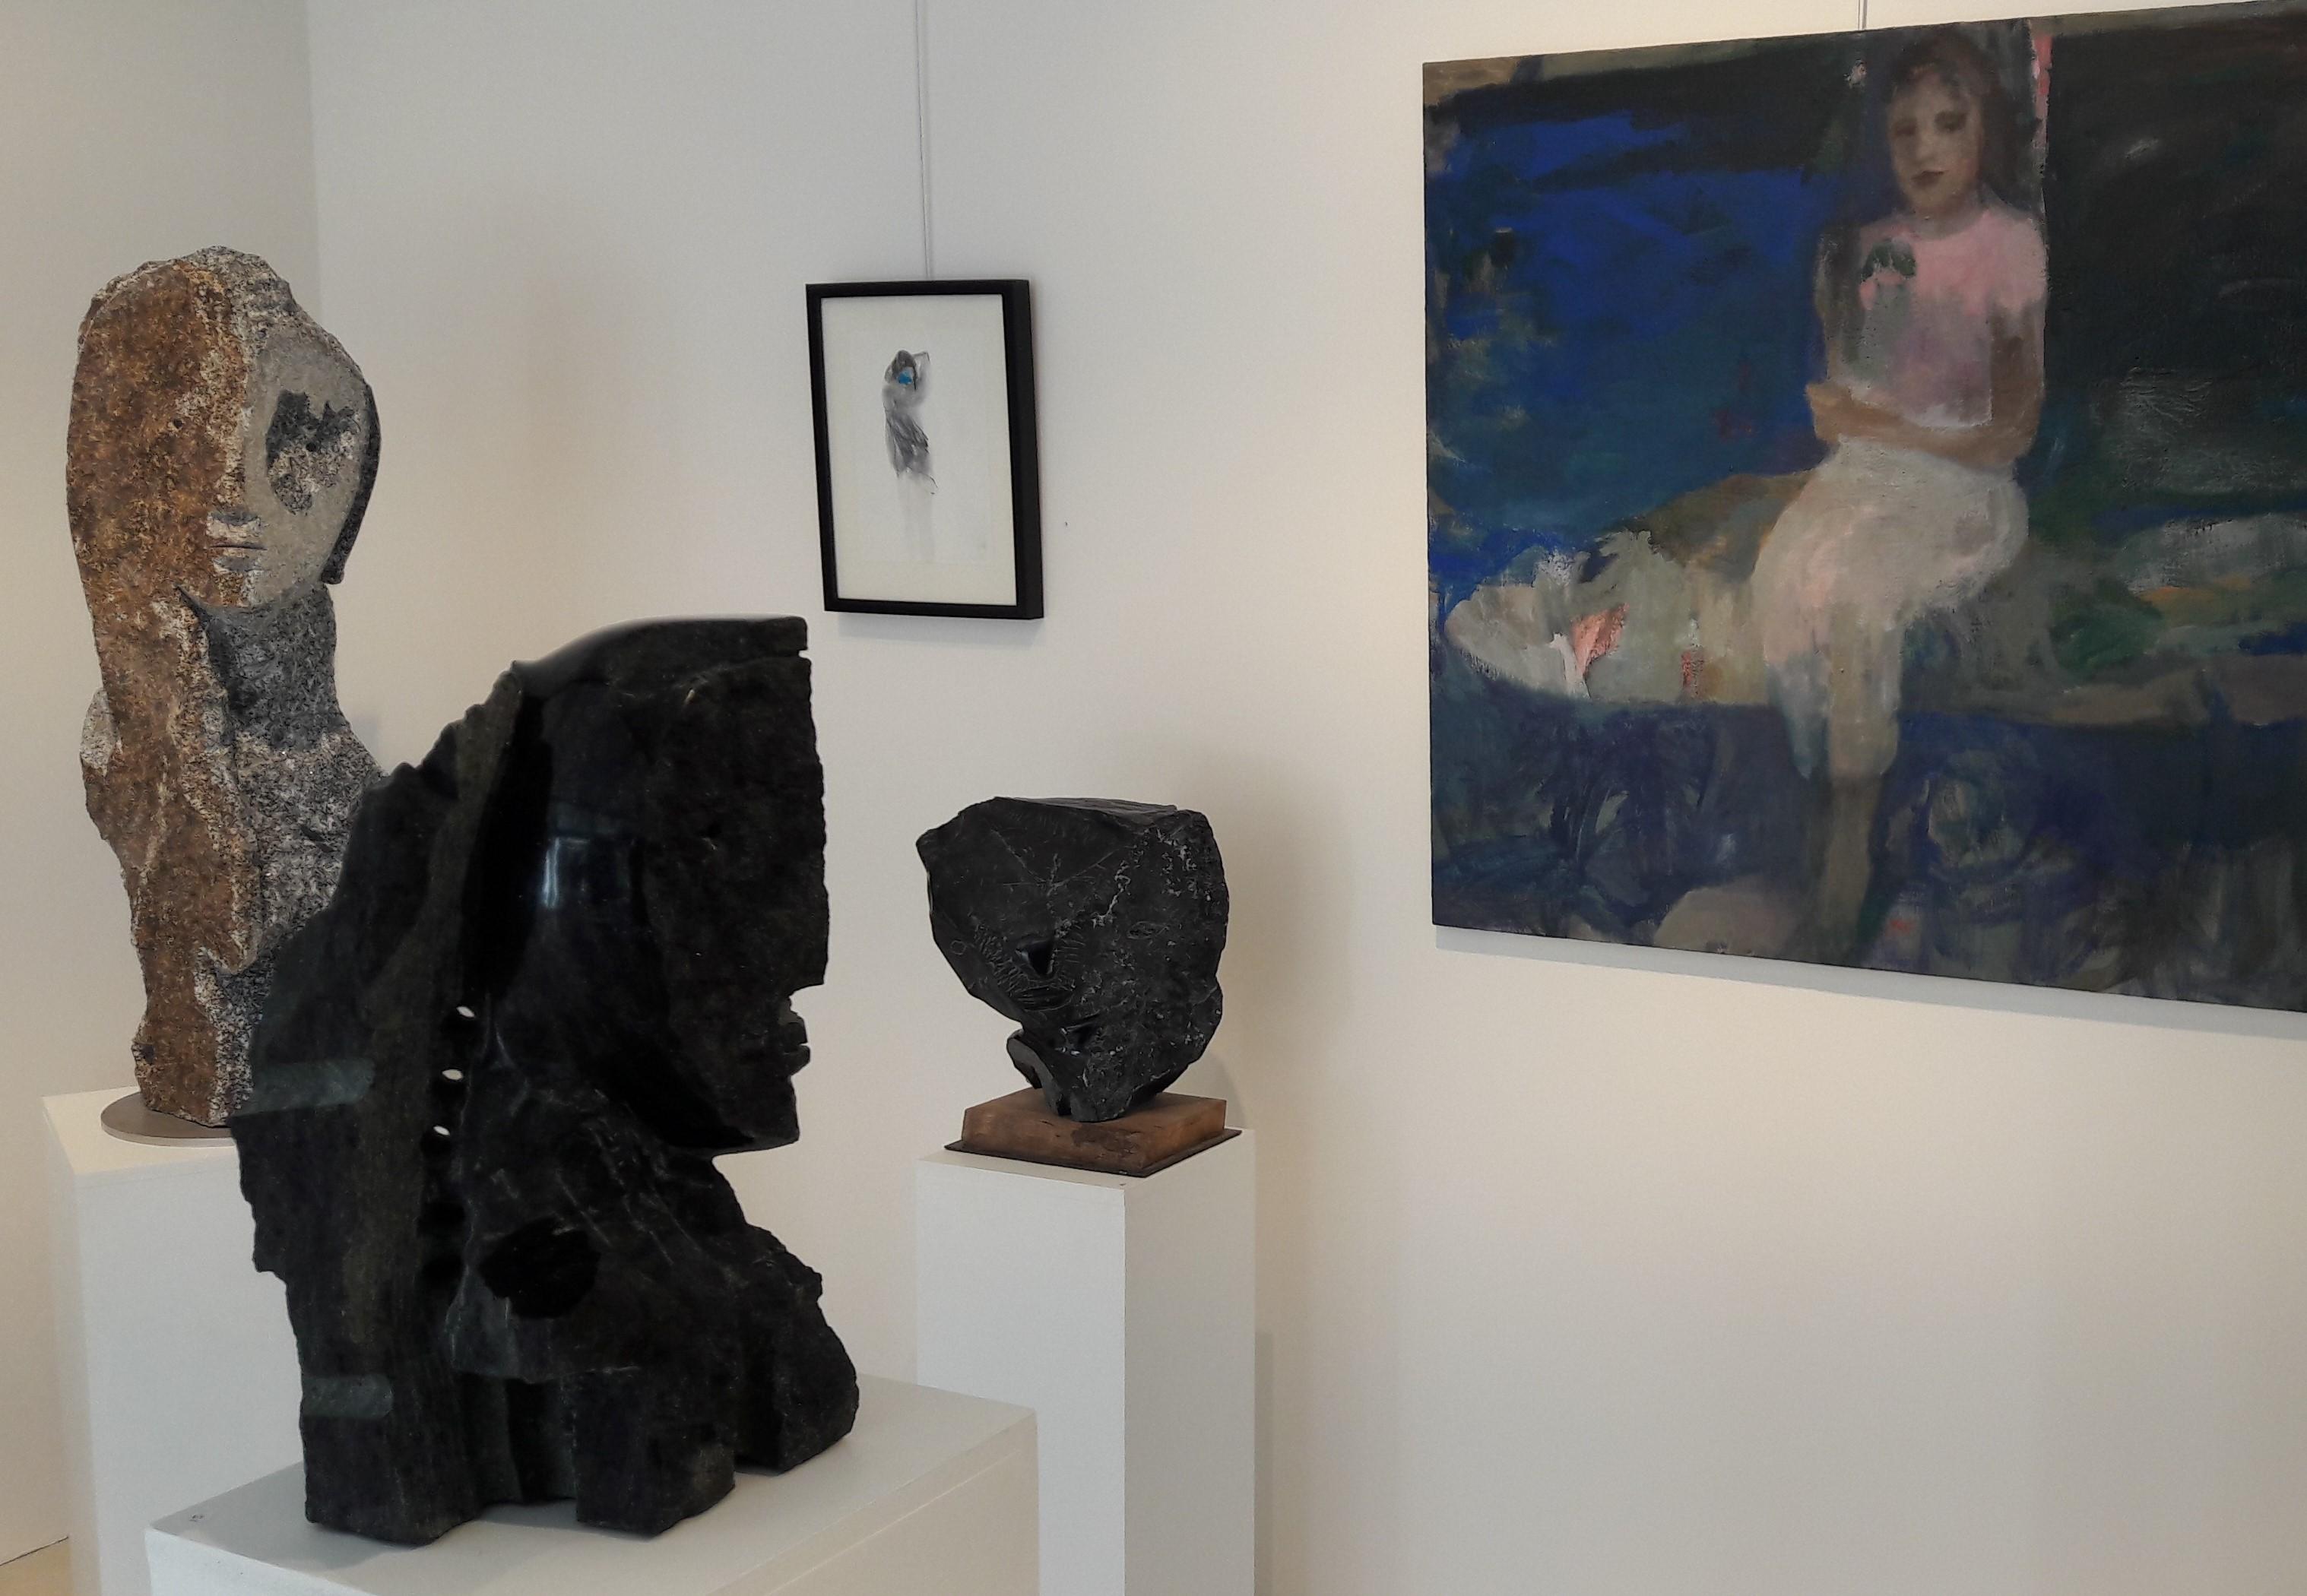 gosti-galerie-florence-b-noirmoutier